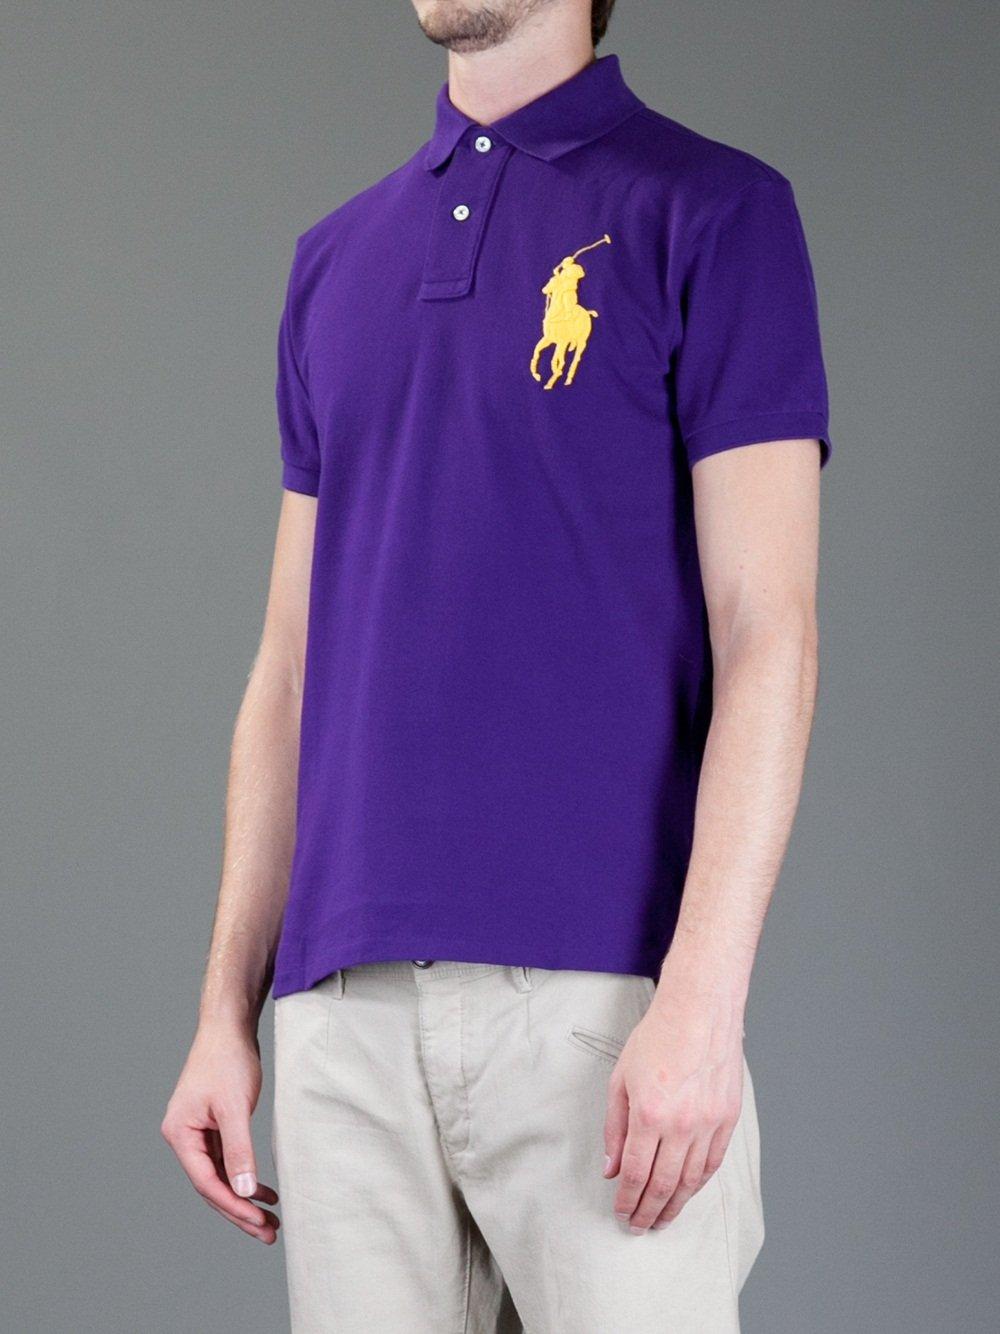 92d50e54ad ... czech ralph lauren blue label logo polo shirt in purple for men lyst  92dbd 09991